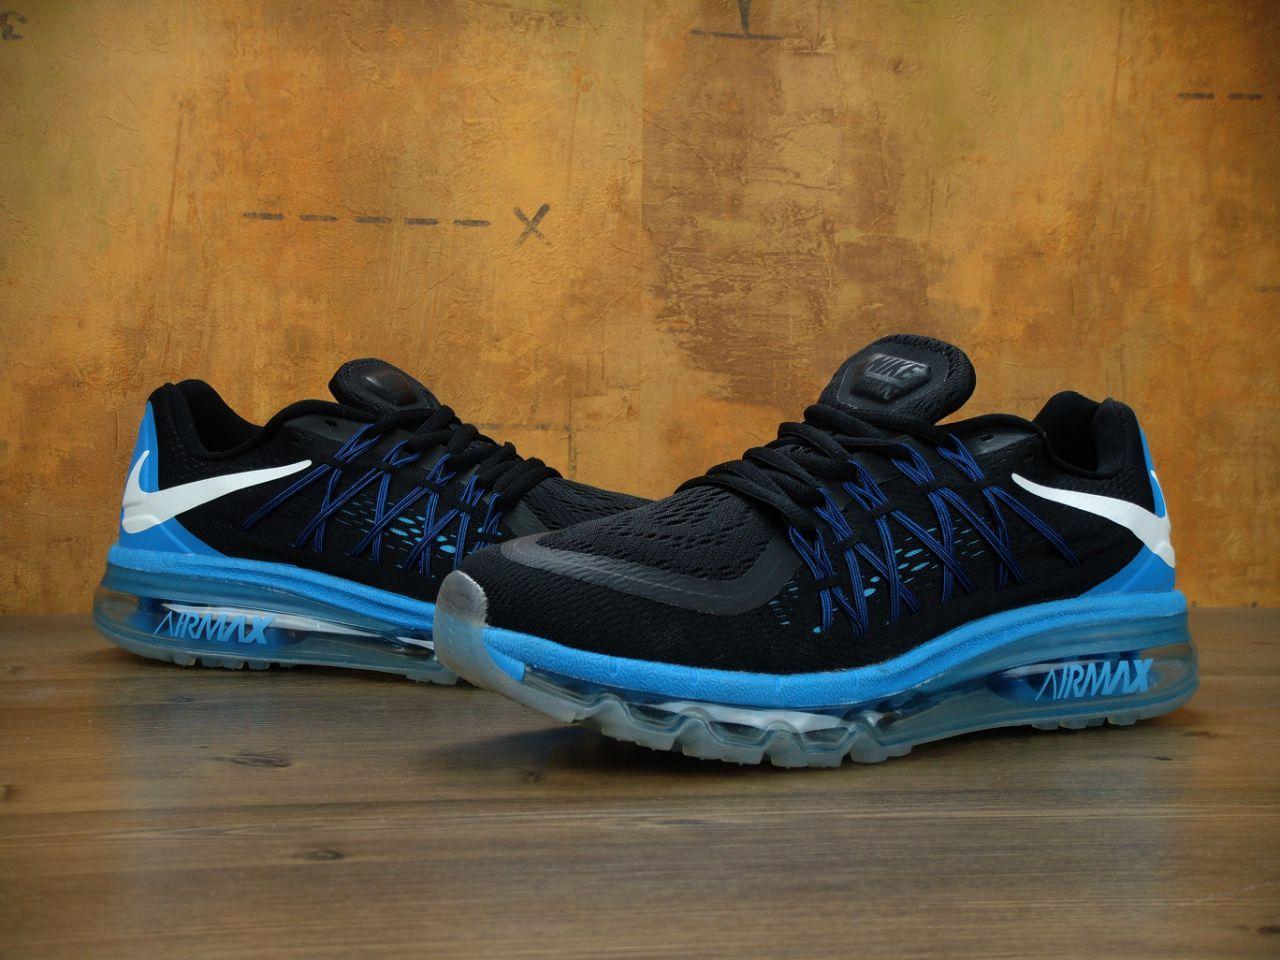 9ff207837 Мужские кроссовки Nike Air Max 2016 Black/Blue, цена 1 300 грн., купить в  Киеве — Prom.ua (ID#590250357)